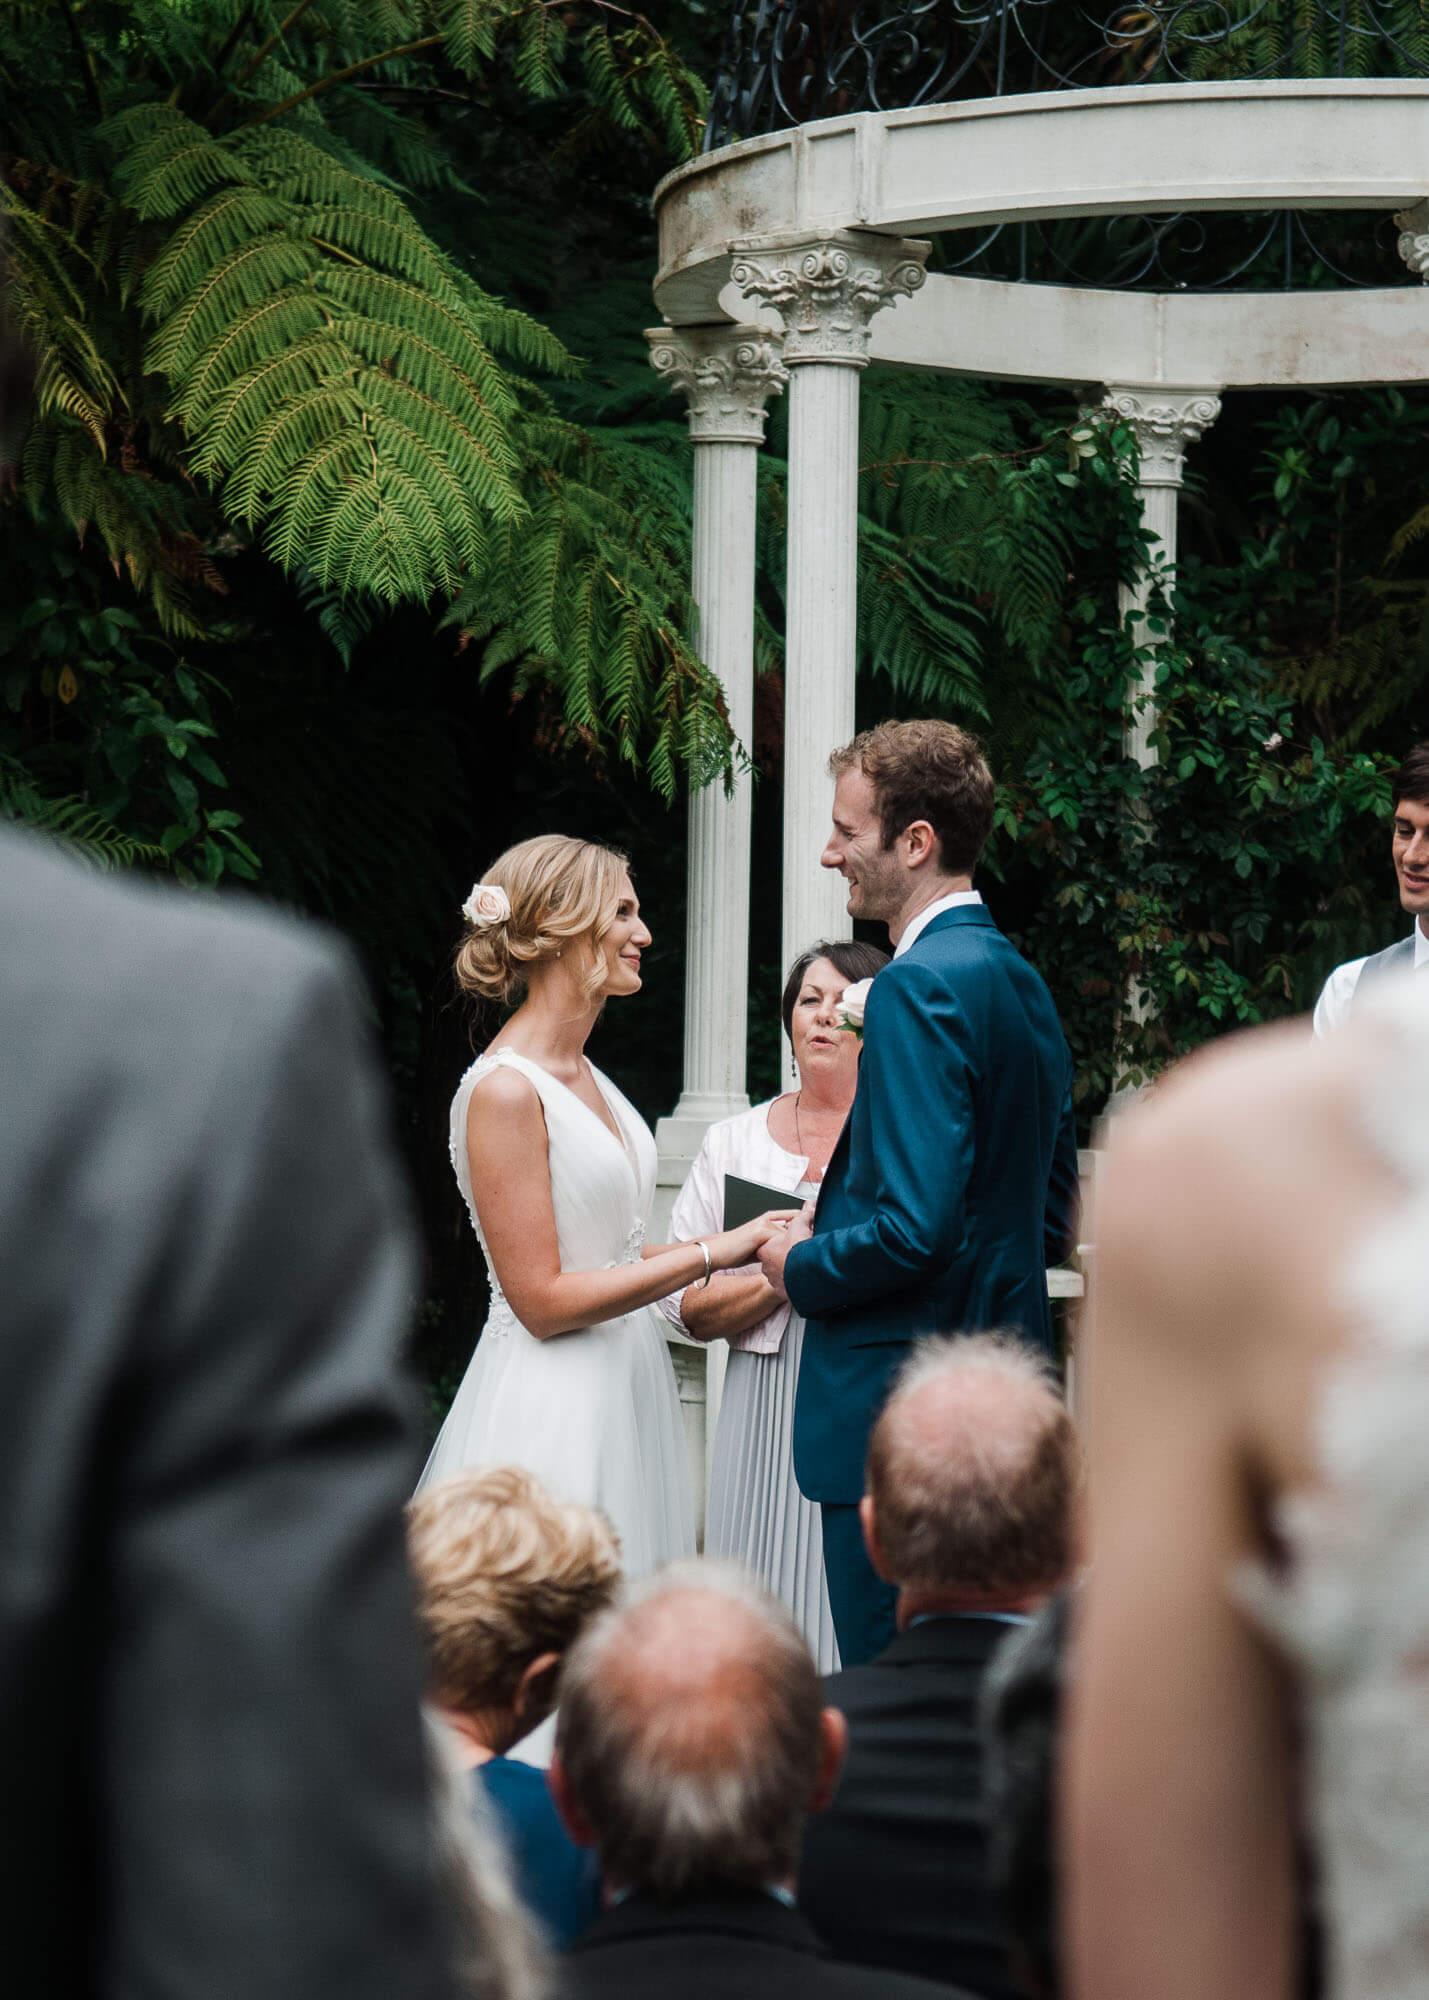 wedding-ceremony-exchange-rings.jpg